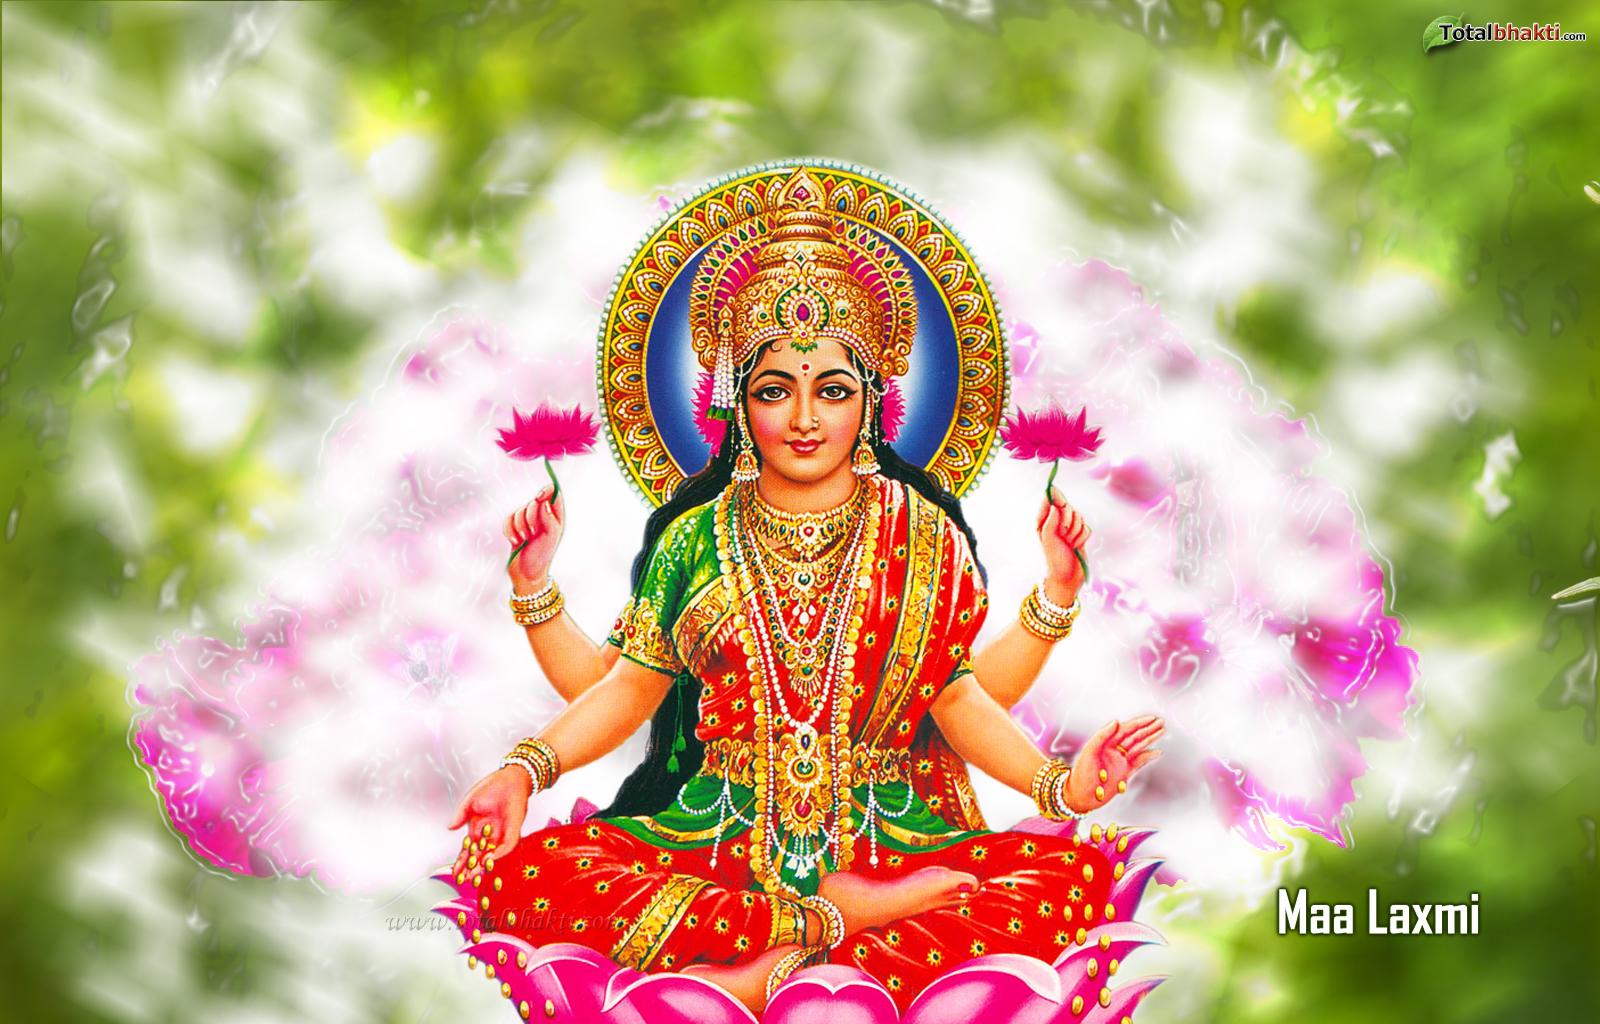 Vadapalli Lakshmi Sannidhi-Narasimha Swami Temple-Vadapalli